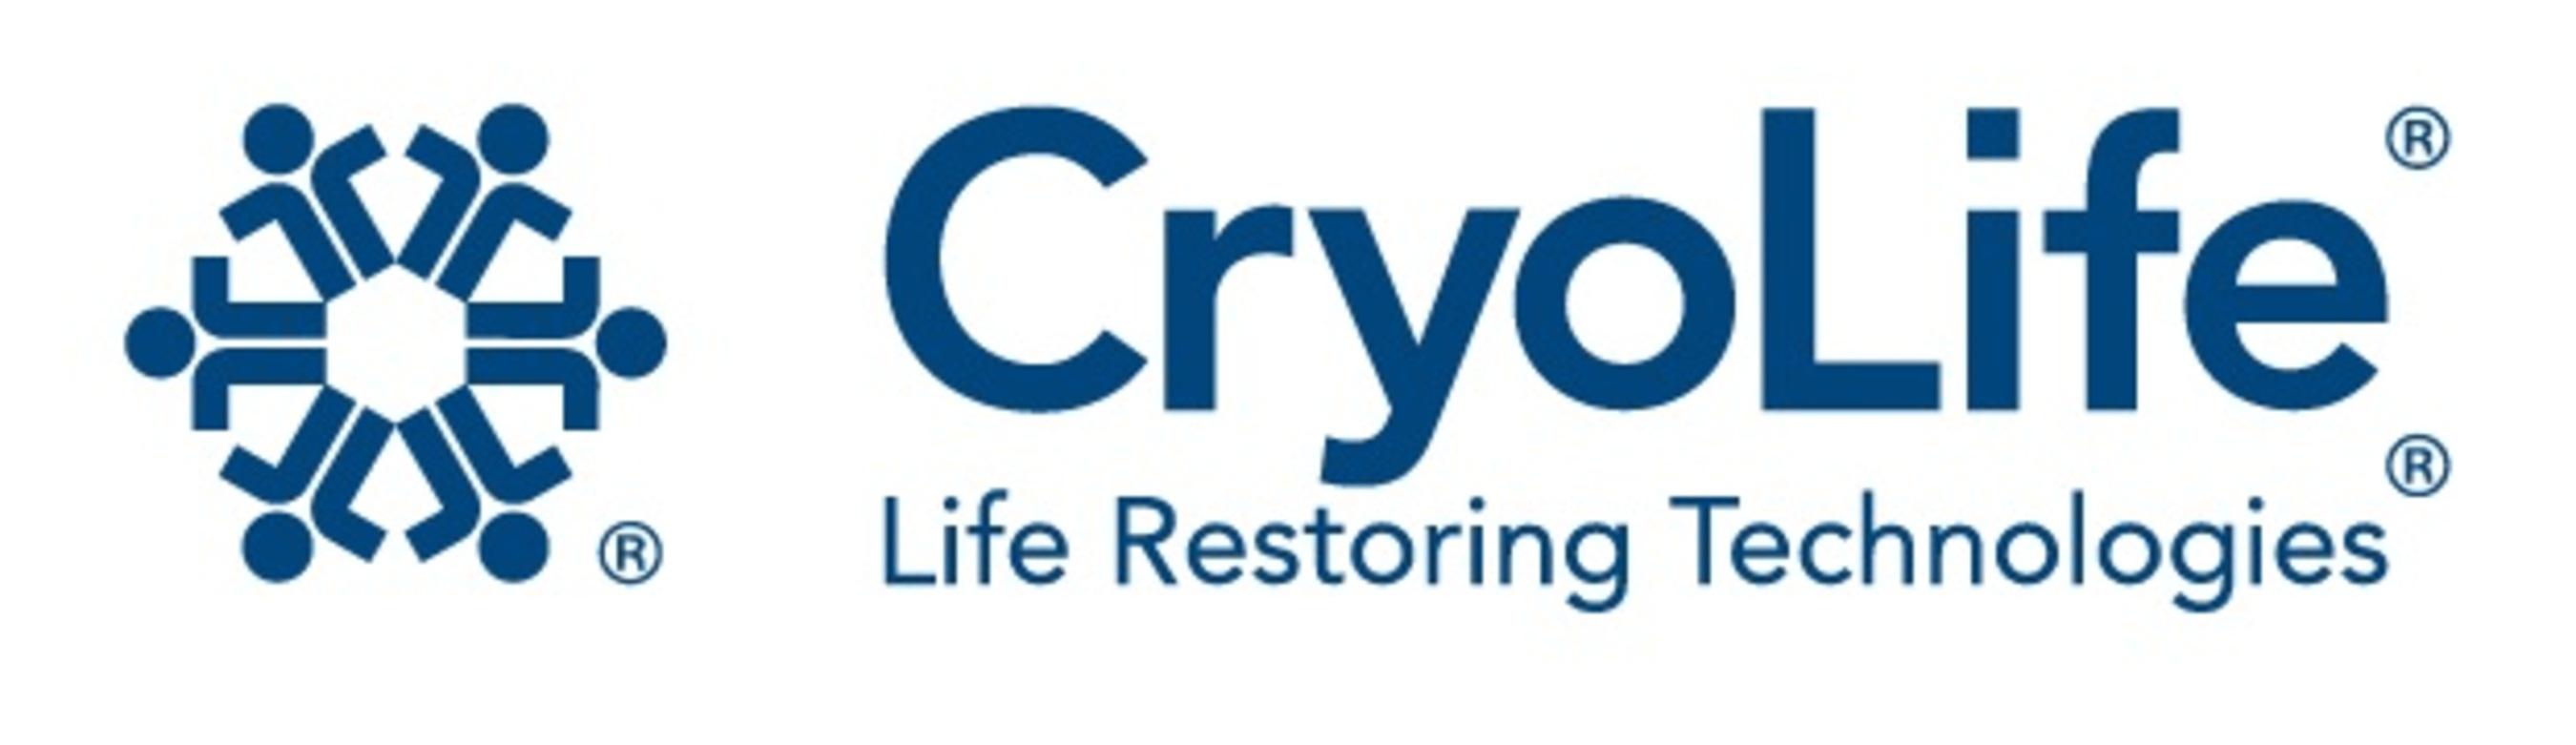 Cryolife logo